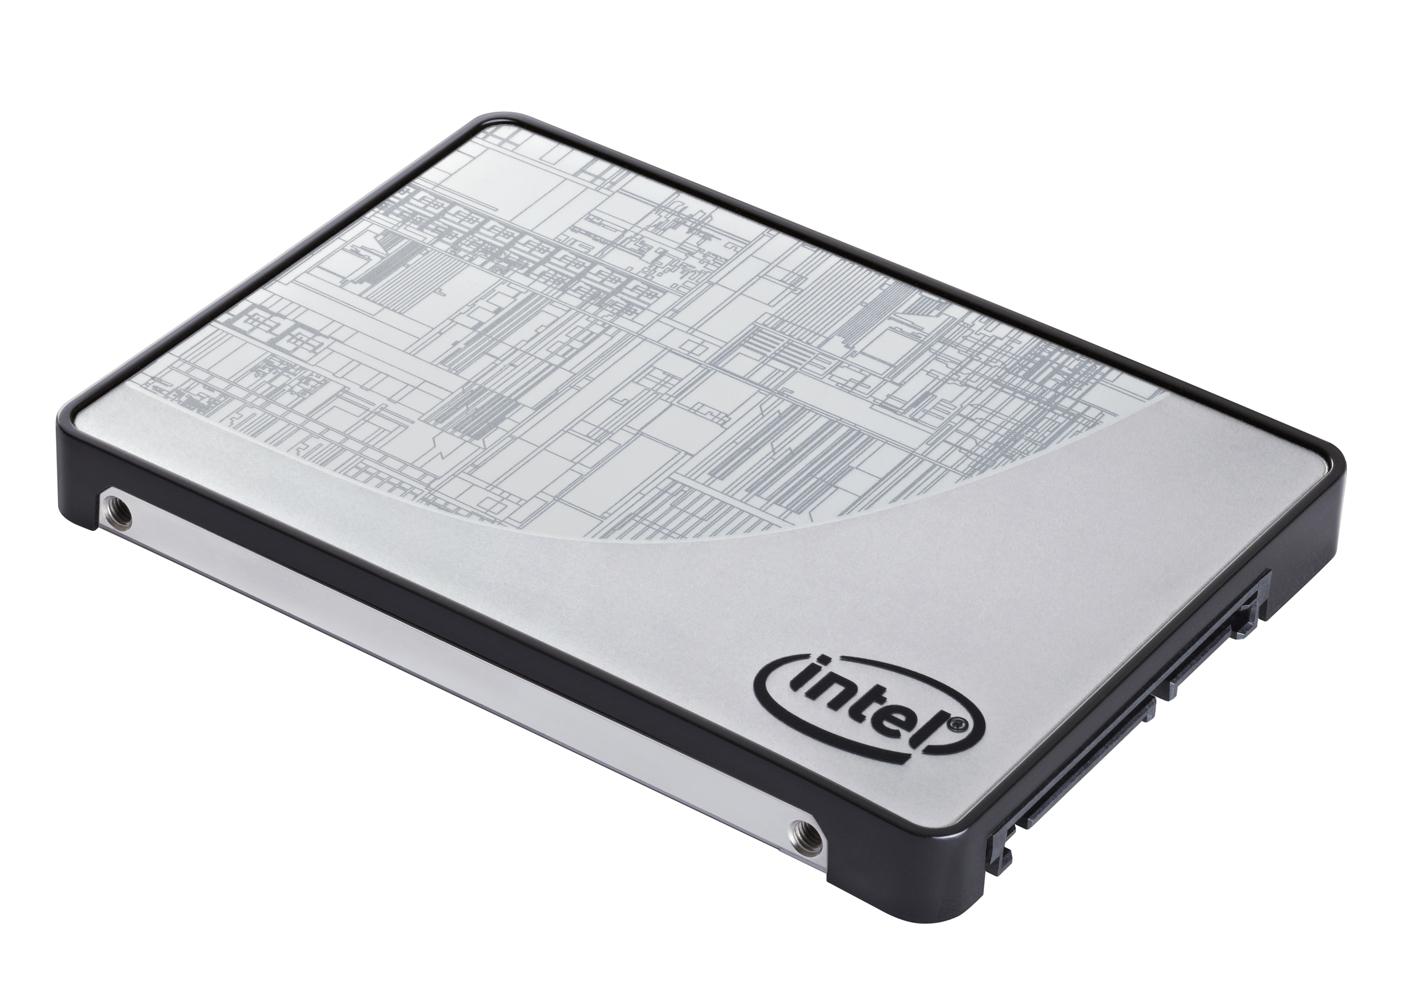 SSD_335_FlatAngle300dpi.jpg